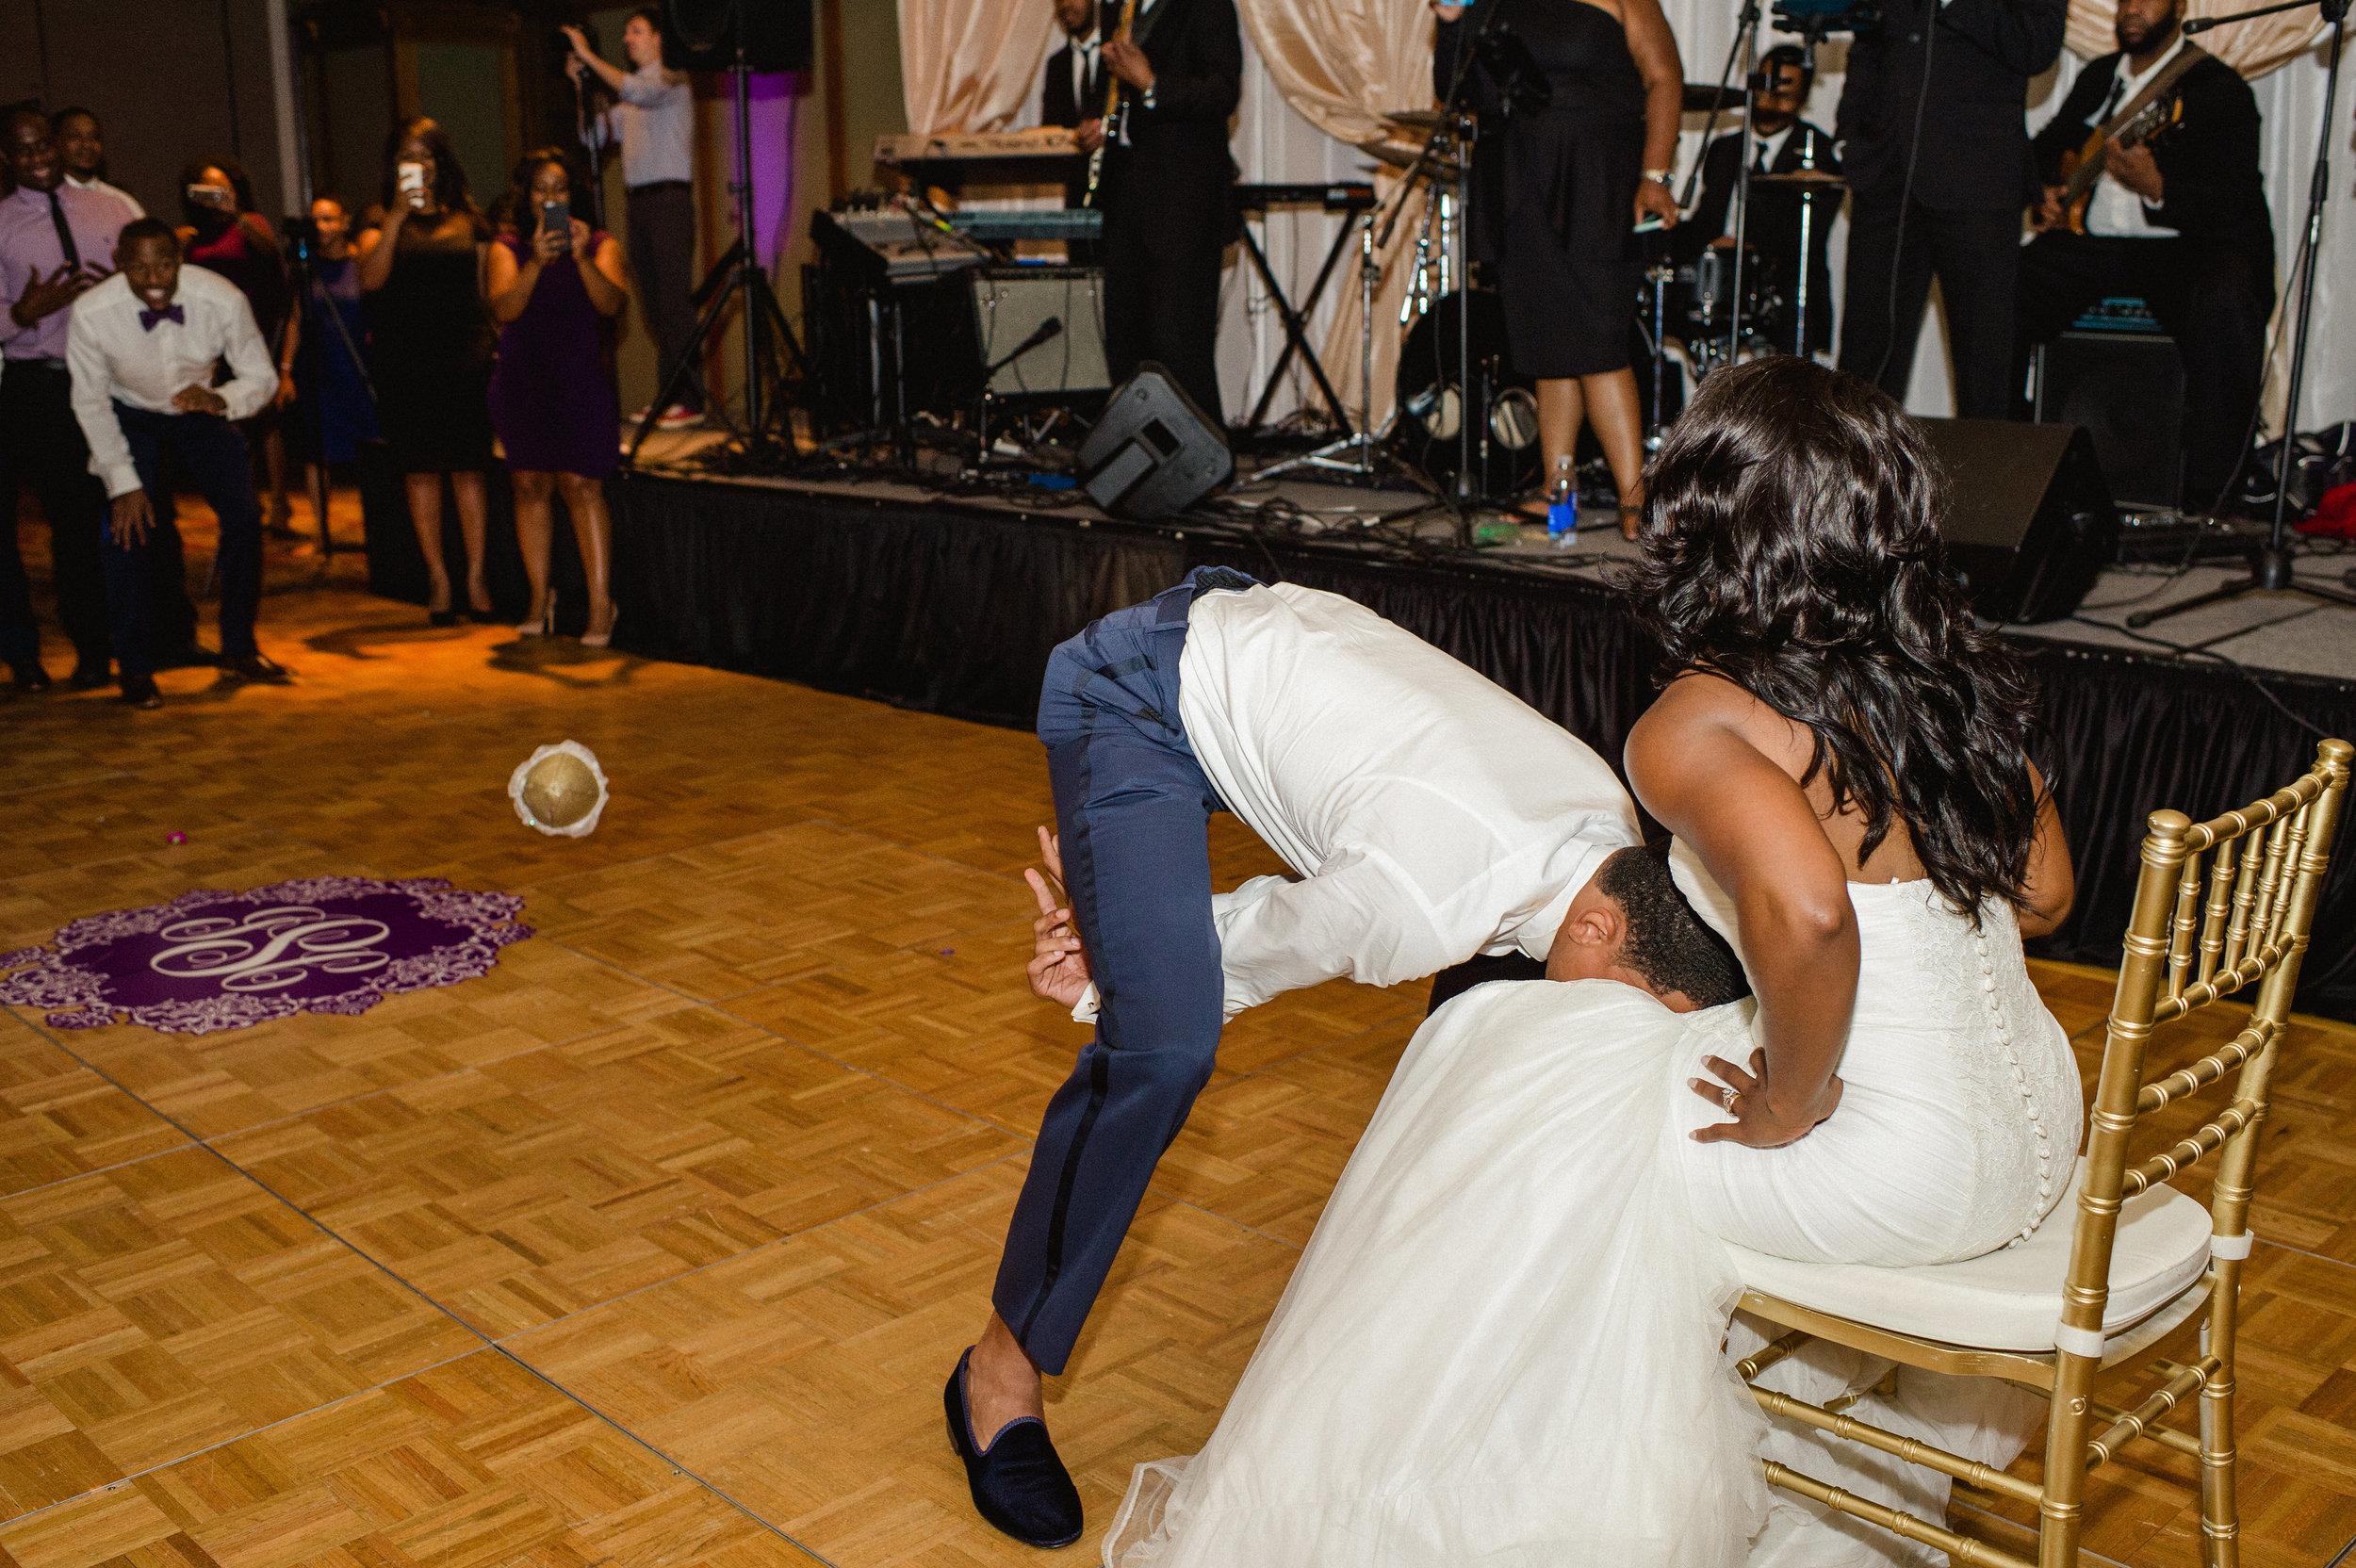 imani&chris|wedding|reception-392.jpg